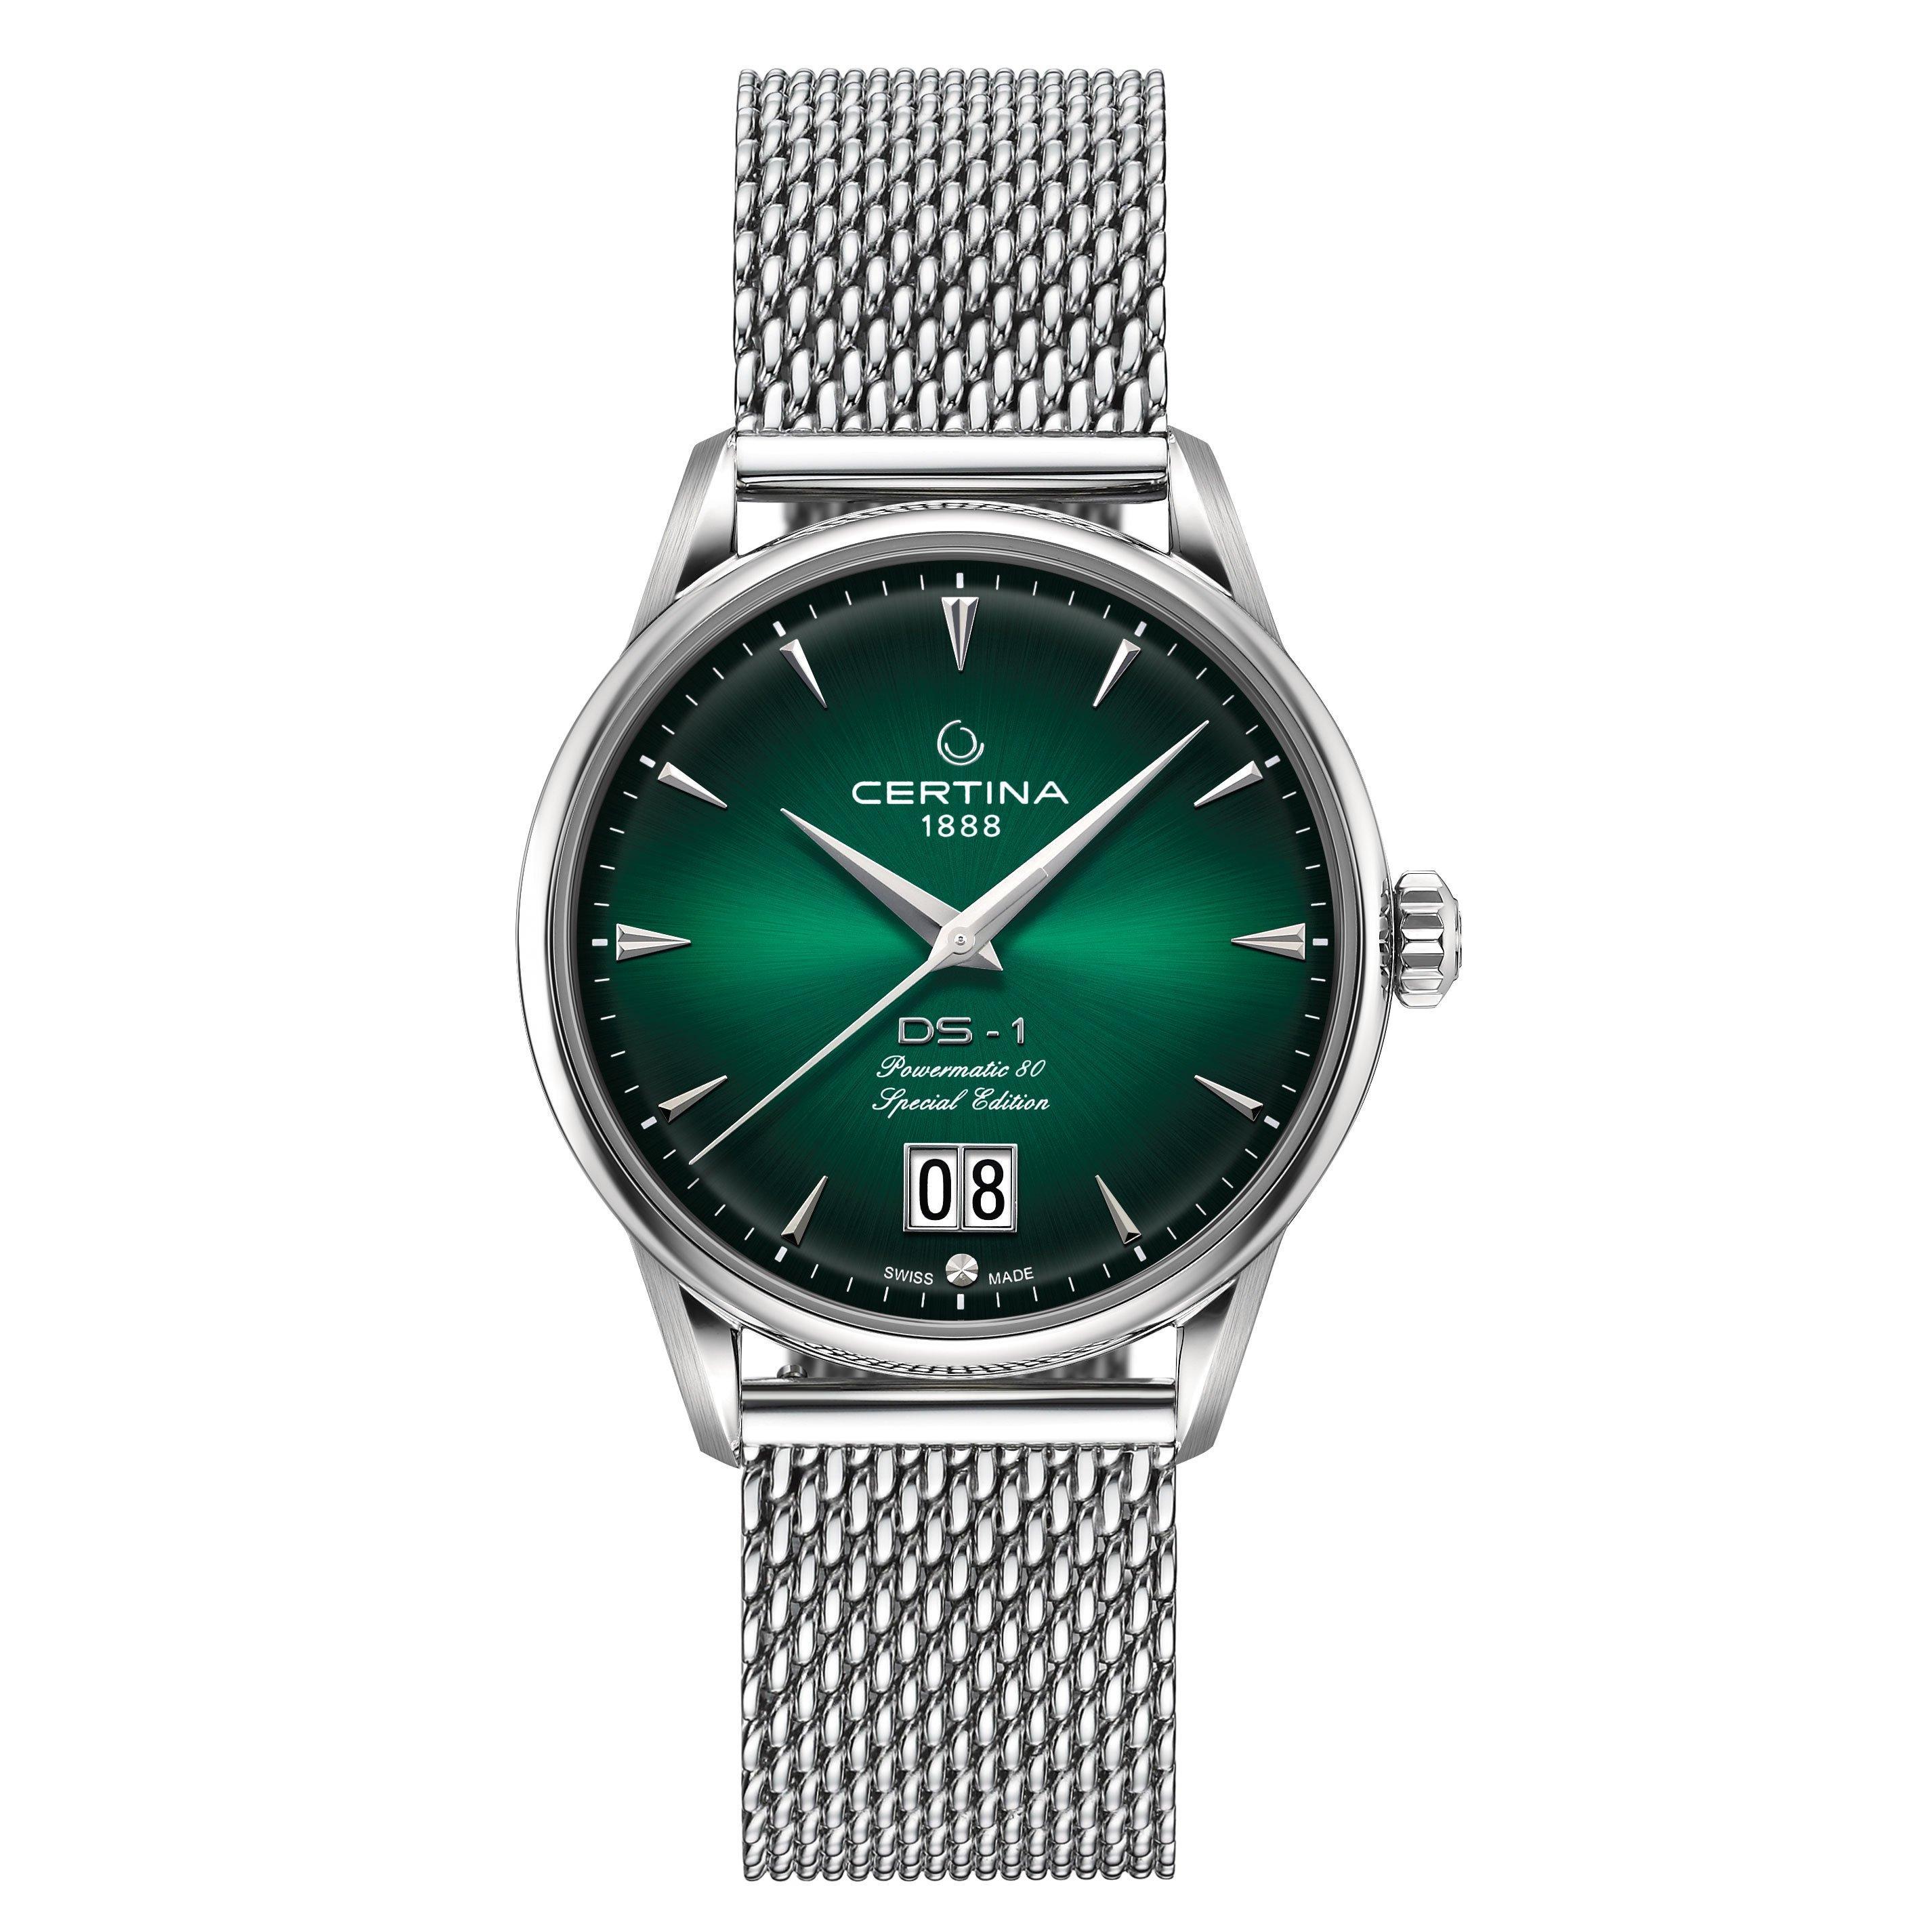 Certina DS-1 Big Date Powermatic 80 Special Edition Men's Watch